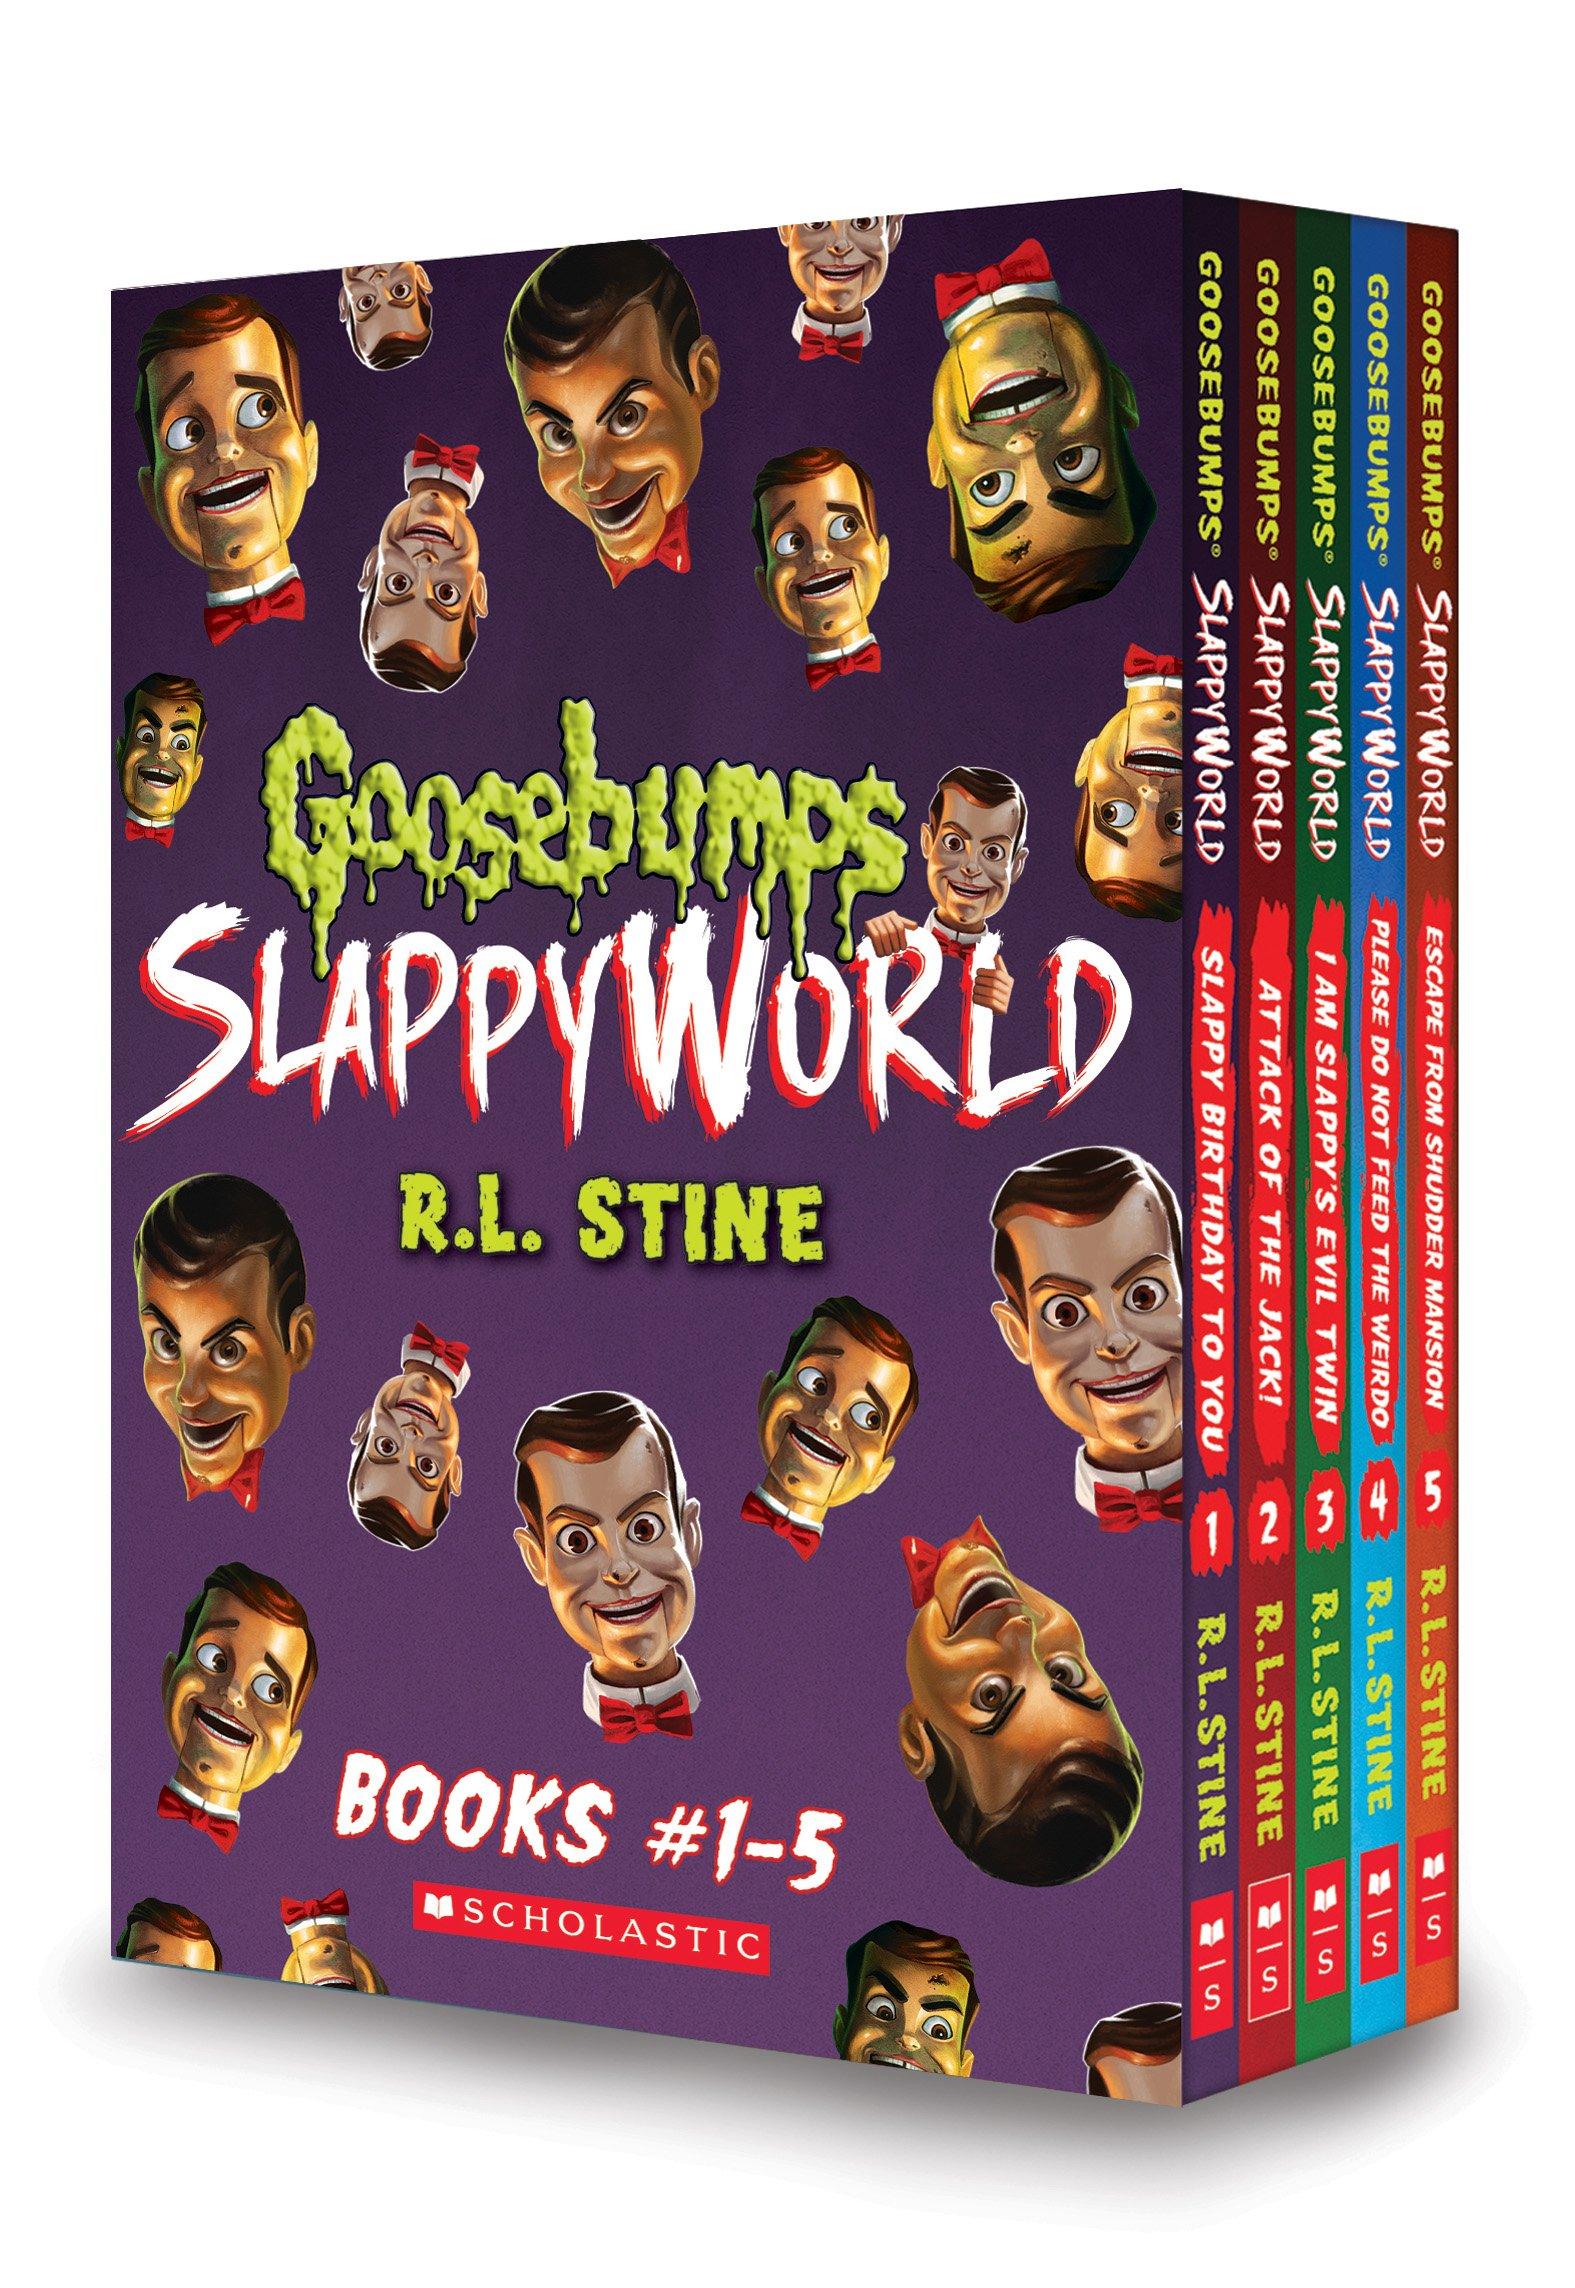 Goosebumps SlappyWorld Box Set: Books 1-5 by Scholastic Inc.